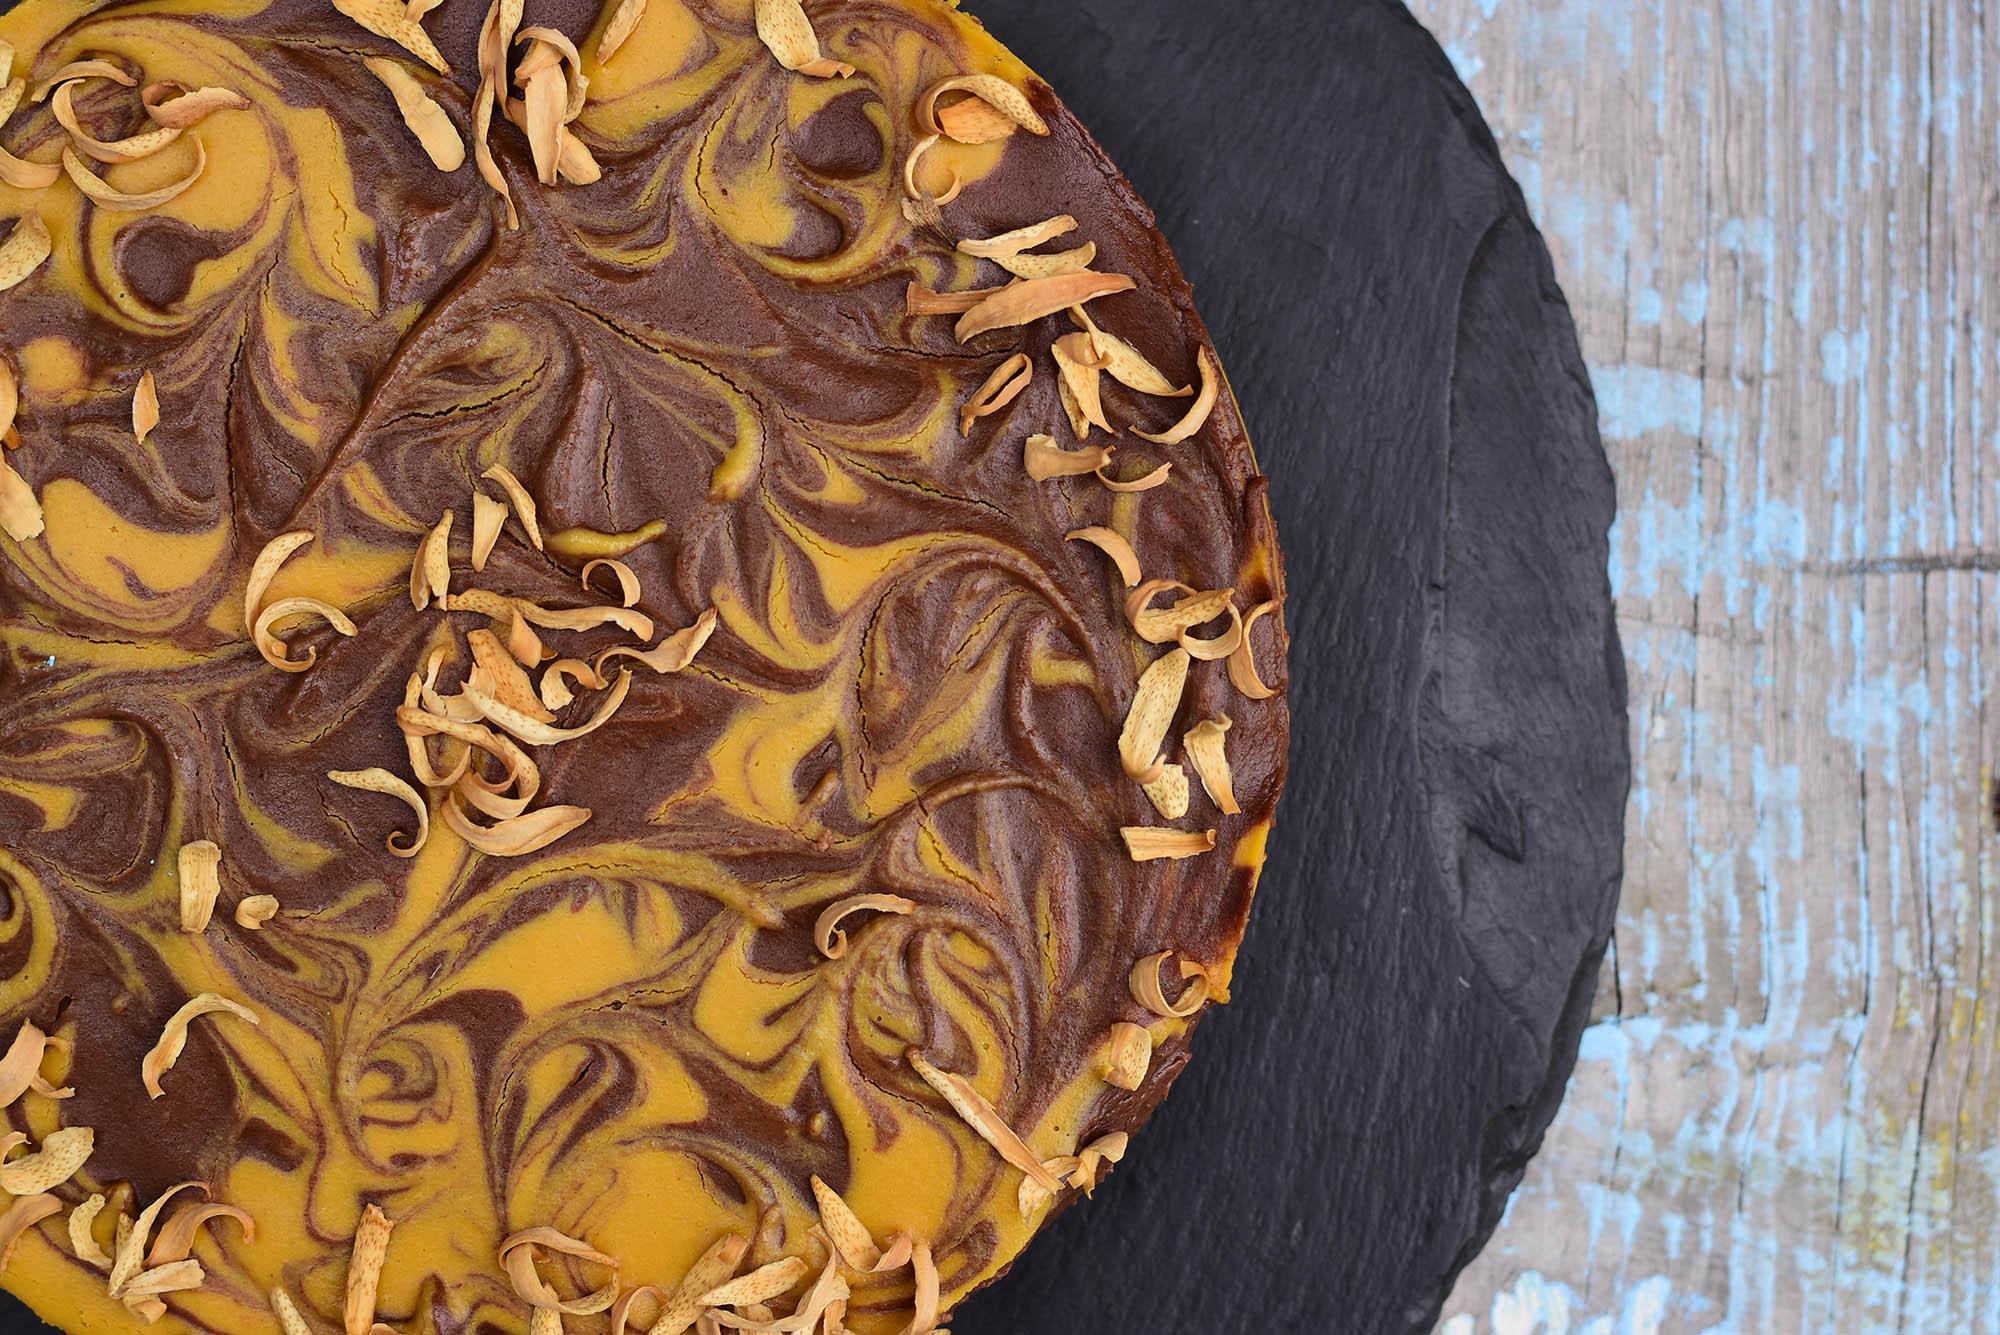 čokomramorový raw vegan dort Ostrava